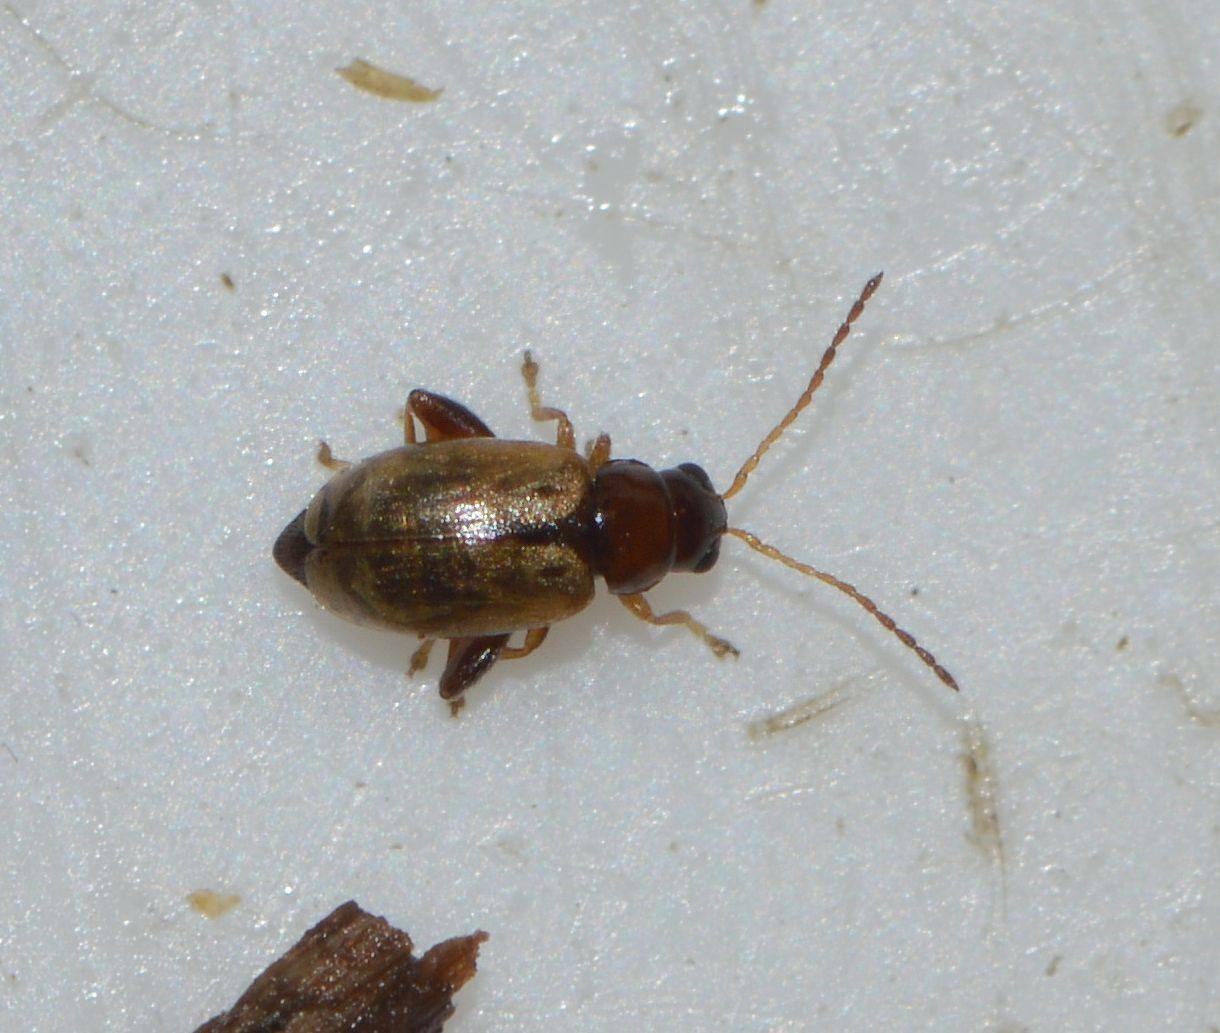 Longitarsus pratensis (Longitarsus pratensis)